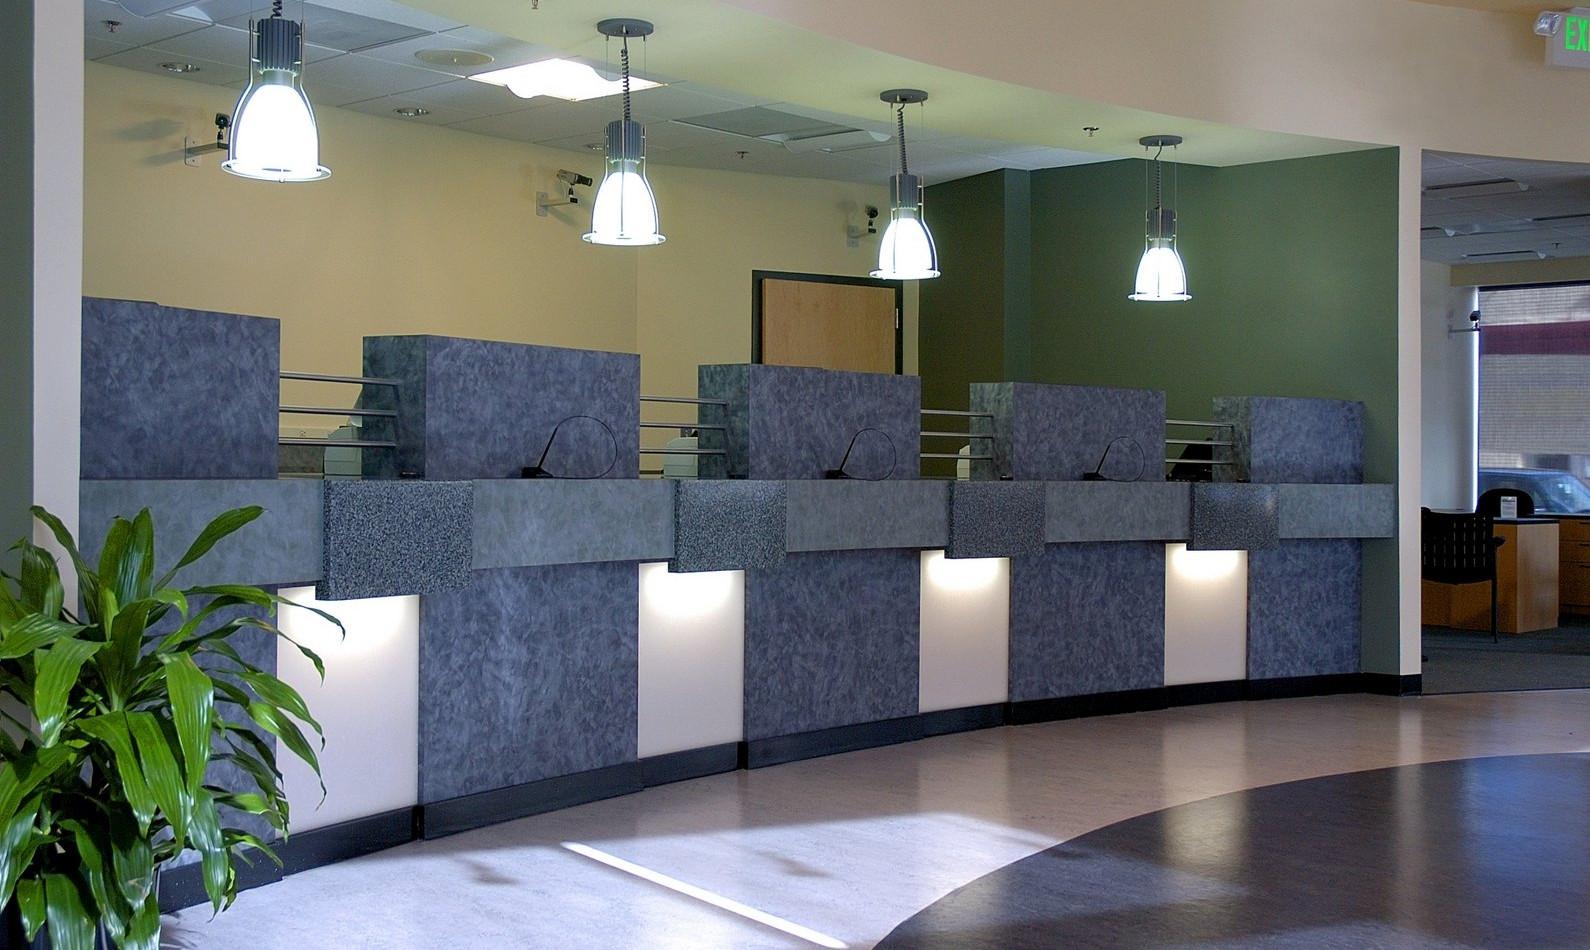 Harbor Bank, BioResearch Branch, Baltimore